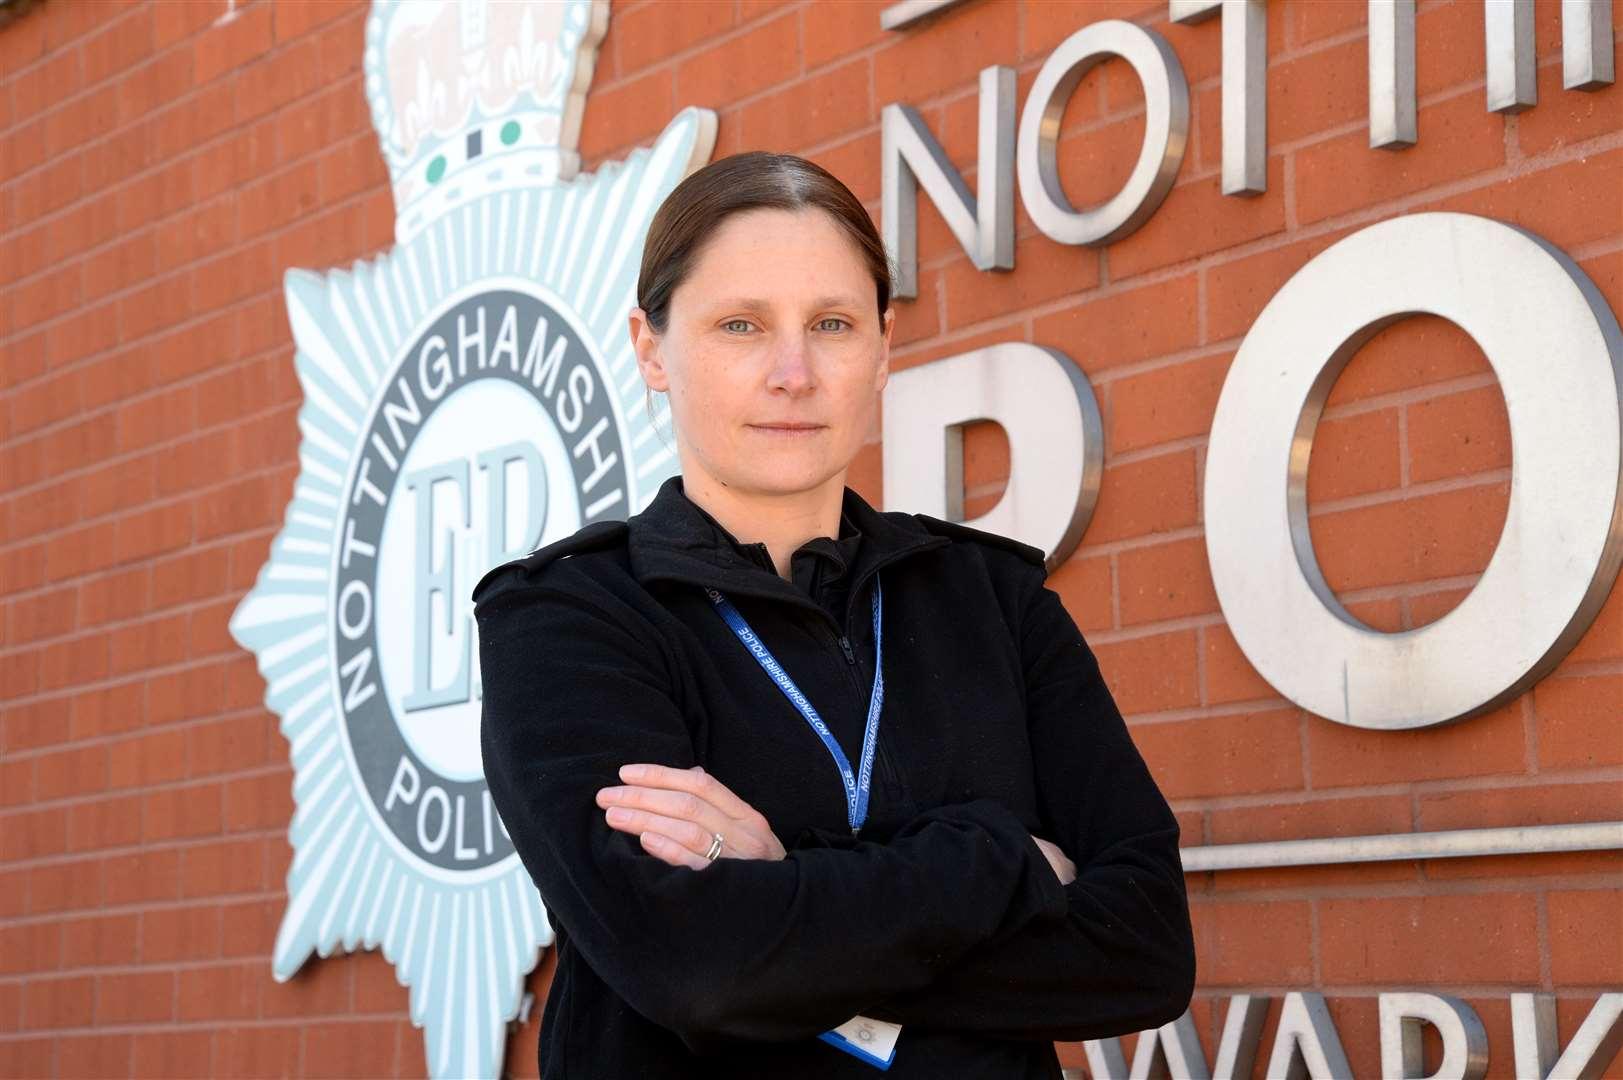 Newark and Sherwood's Commanding Officer for Police Inspector Charlotte Allardice.